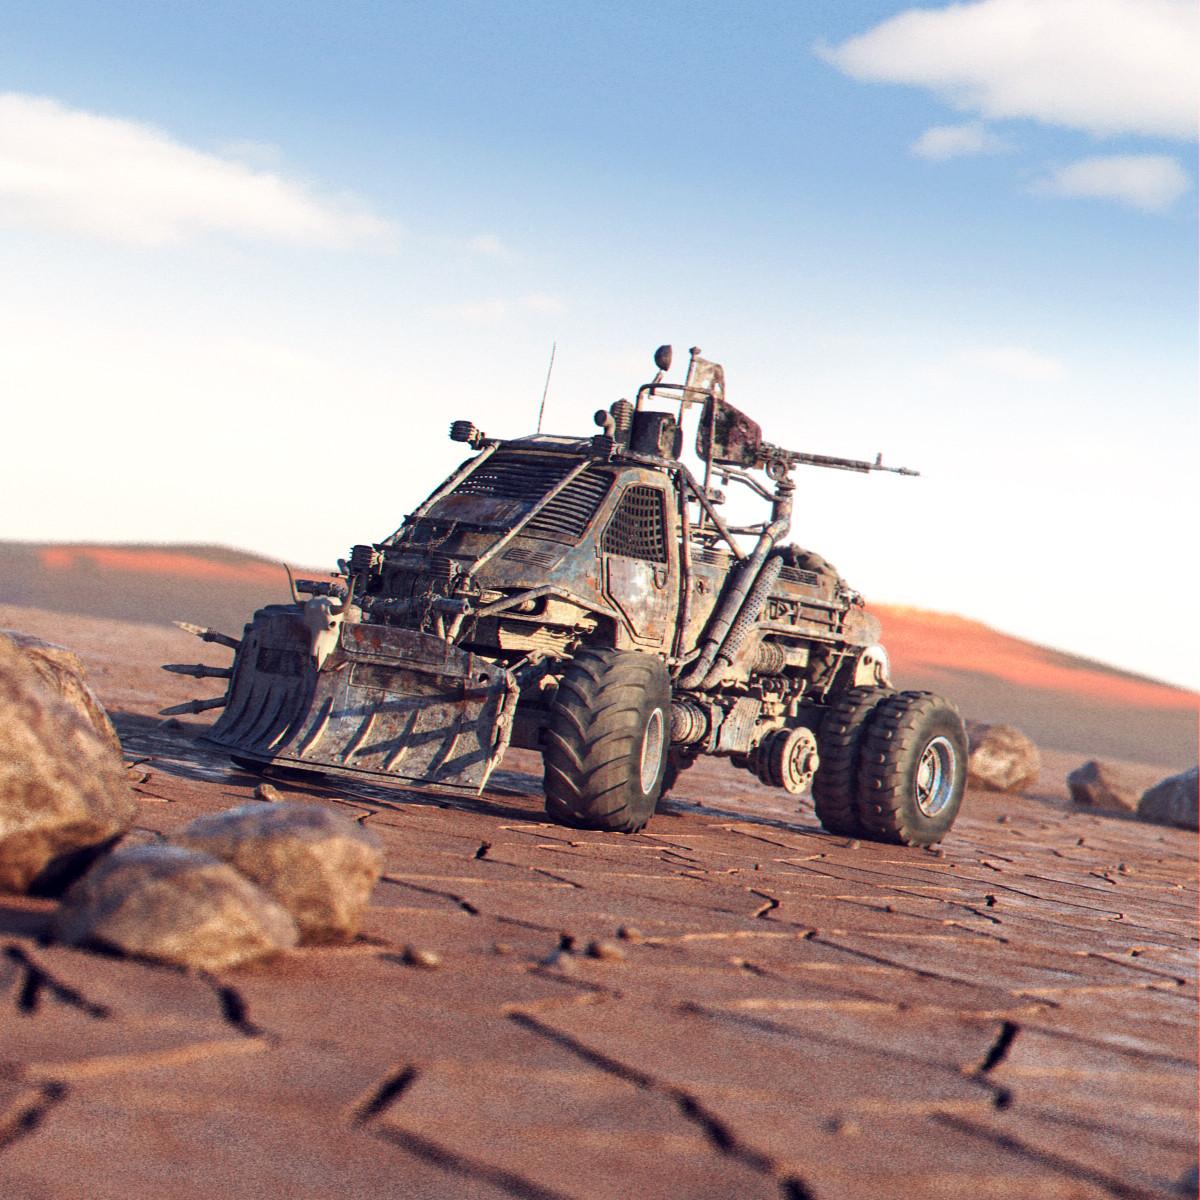 deserttruck_001.jpg